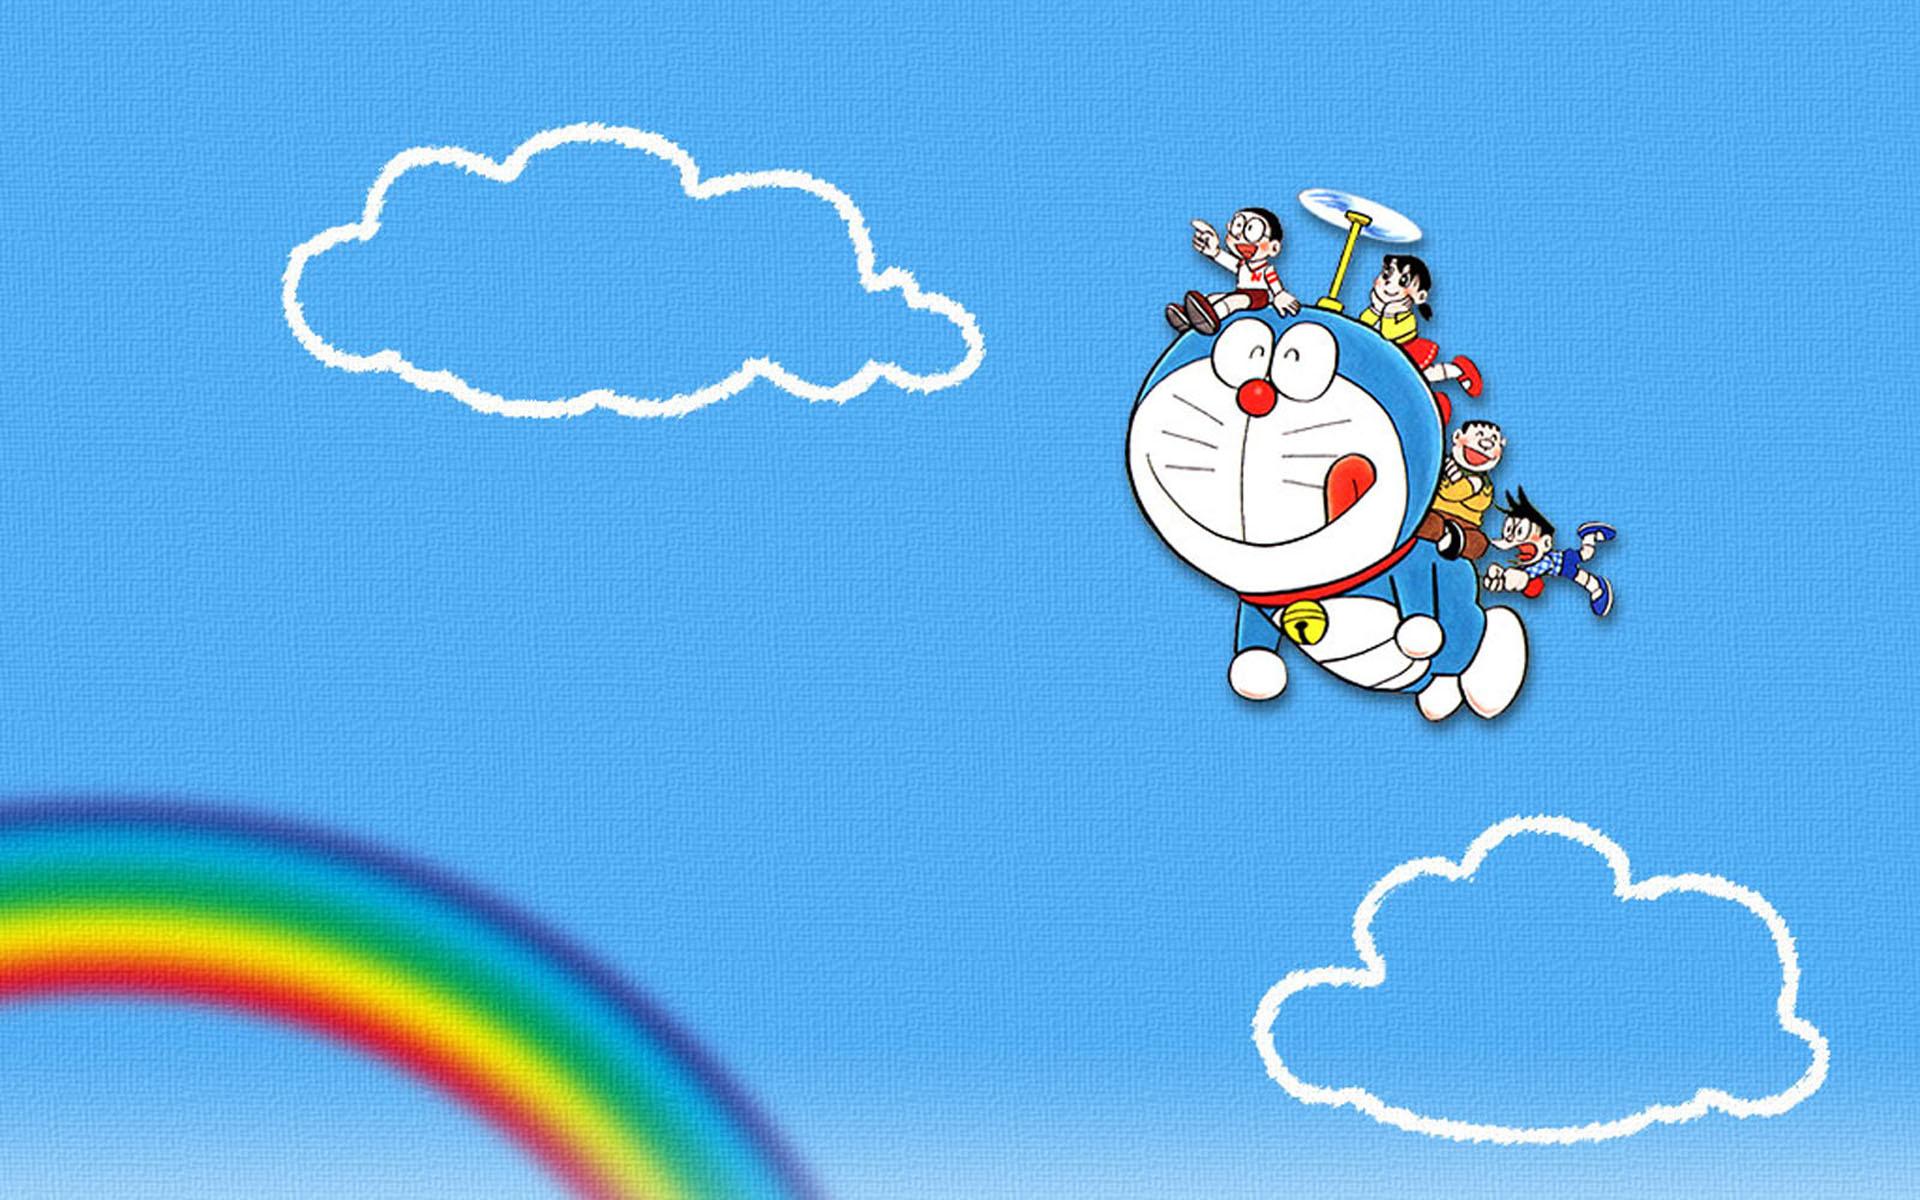 73 Wallpapers Doraemon On Wallpapersafari